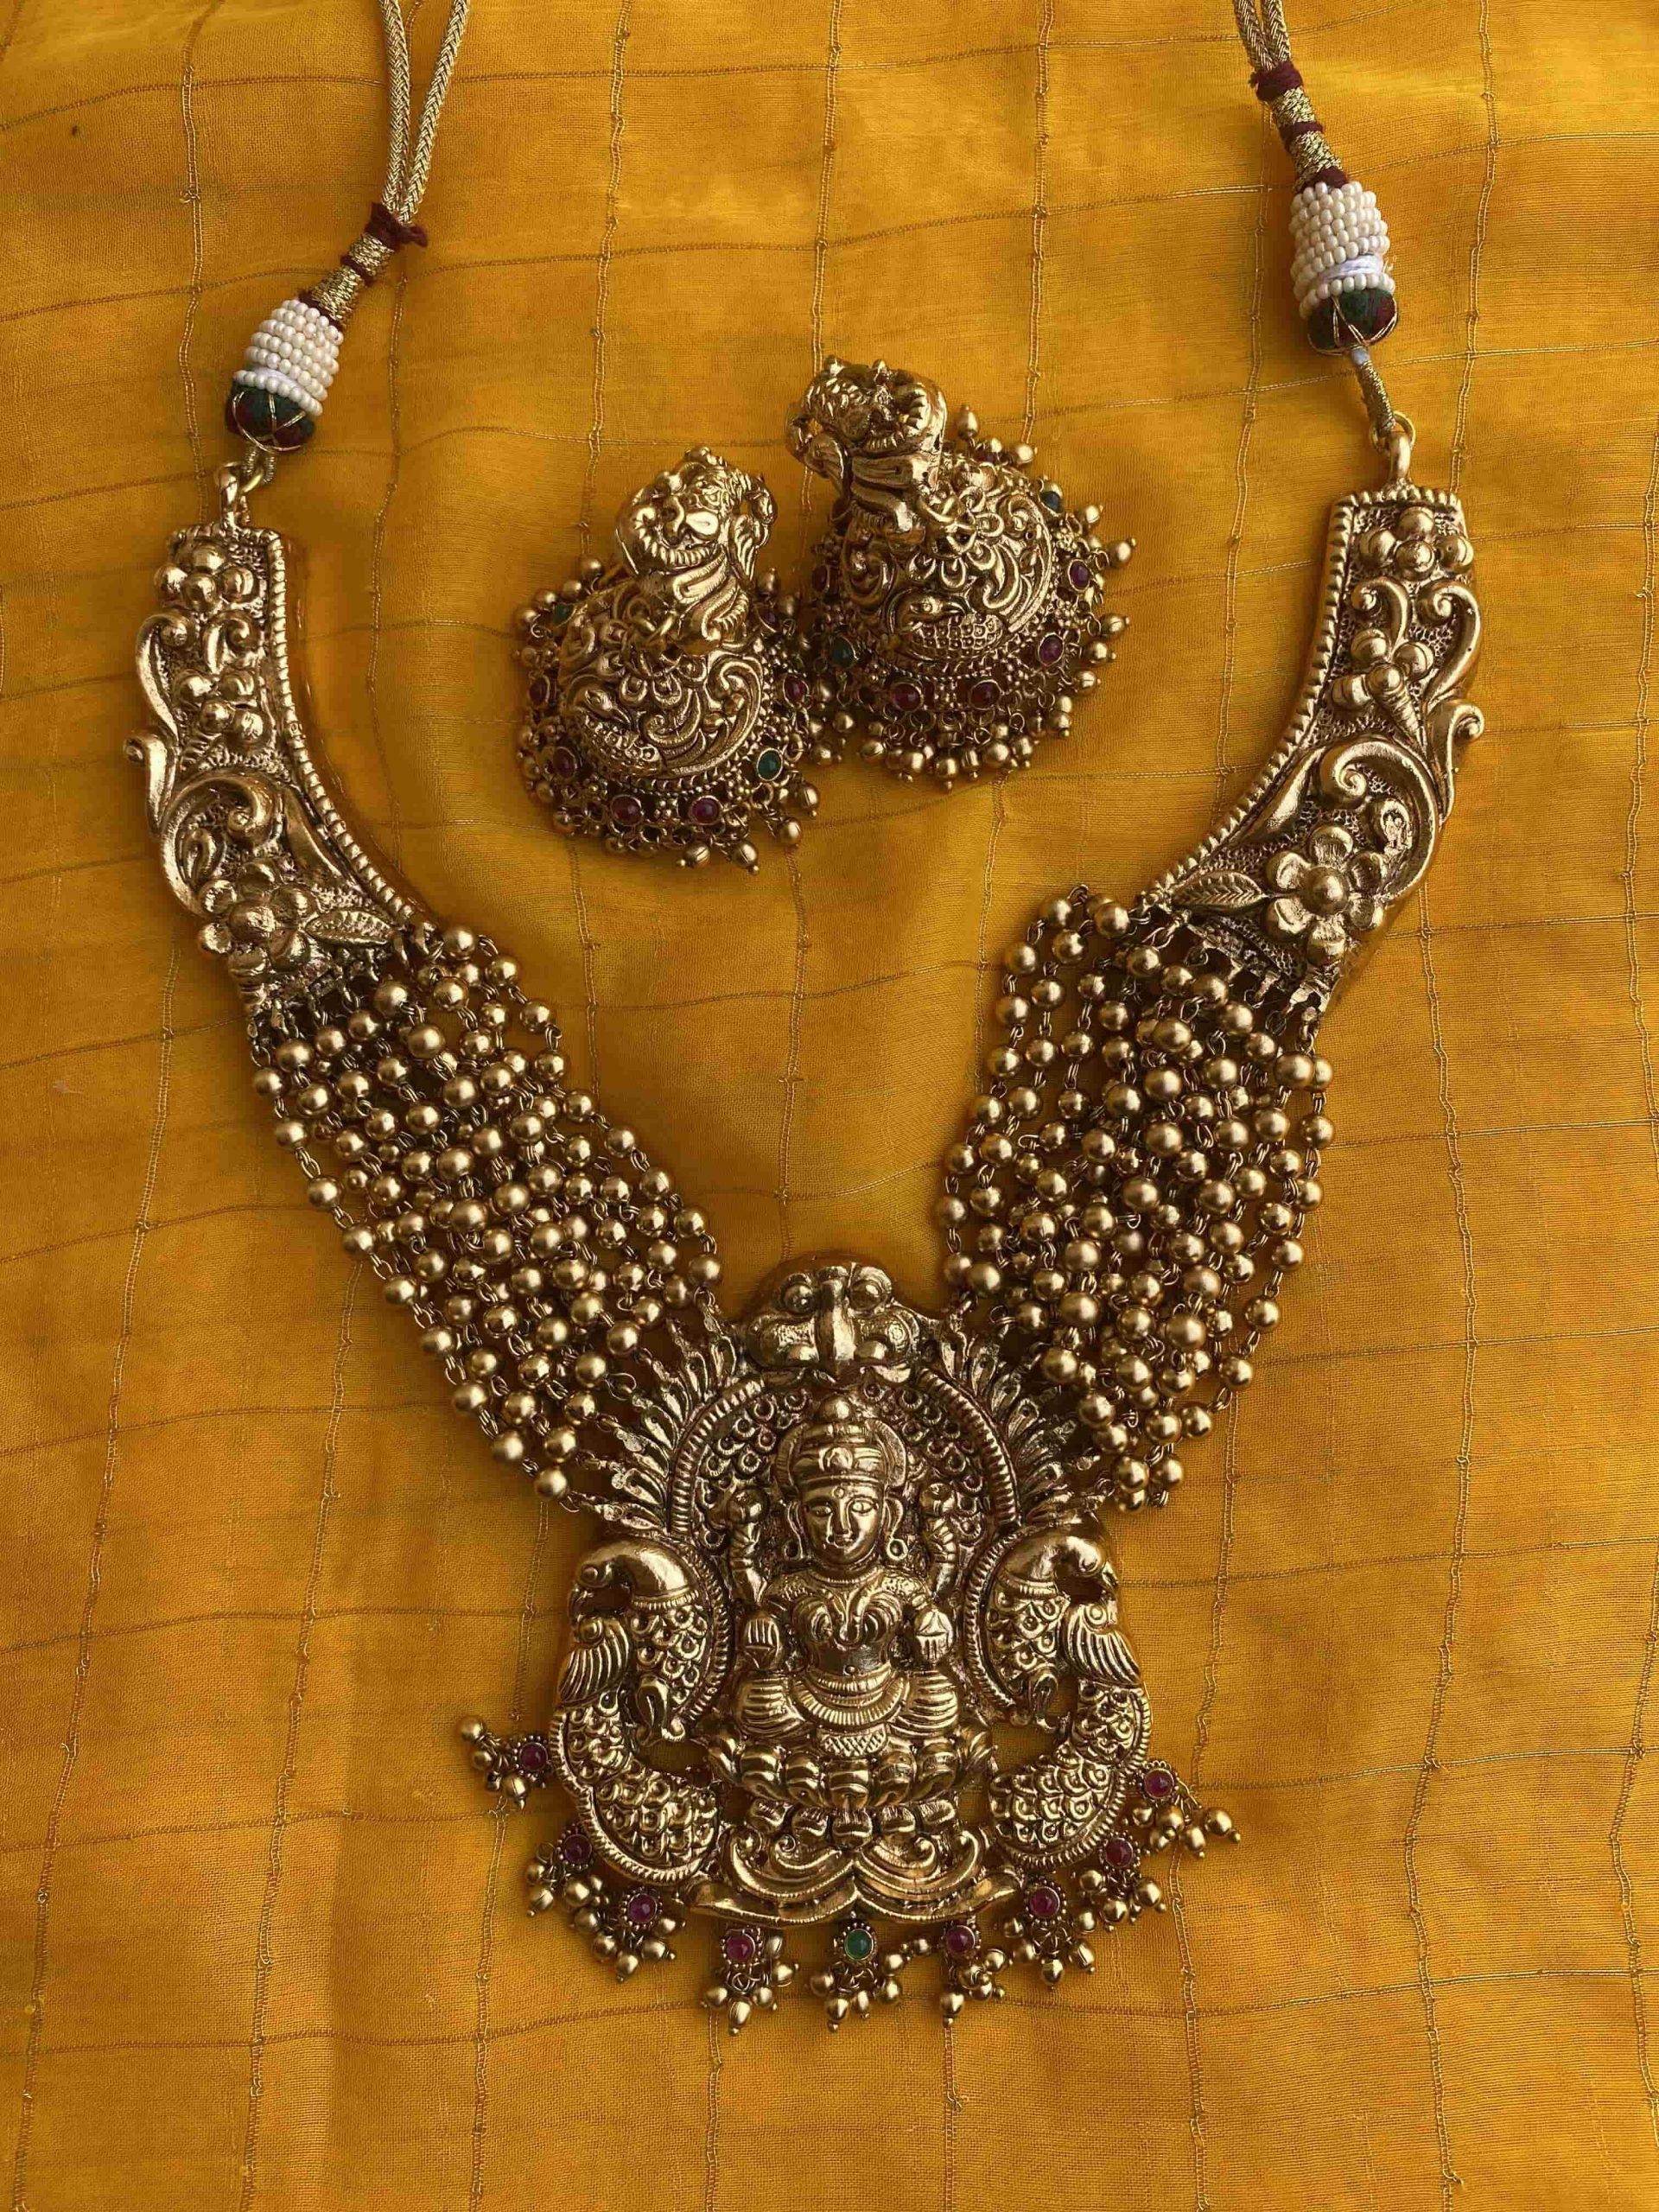 Grand-Bridal-Golden-Guttapusalu-Lakshmi-Necklace-01